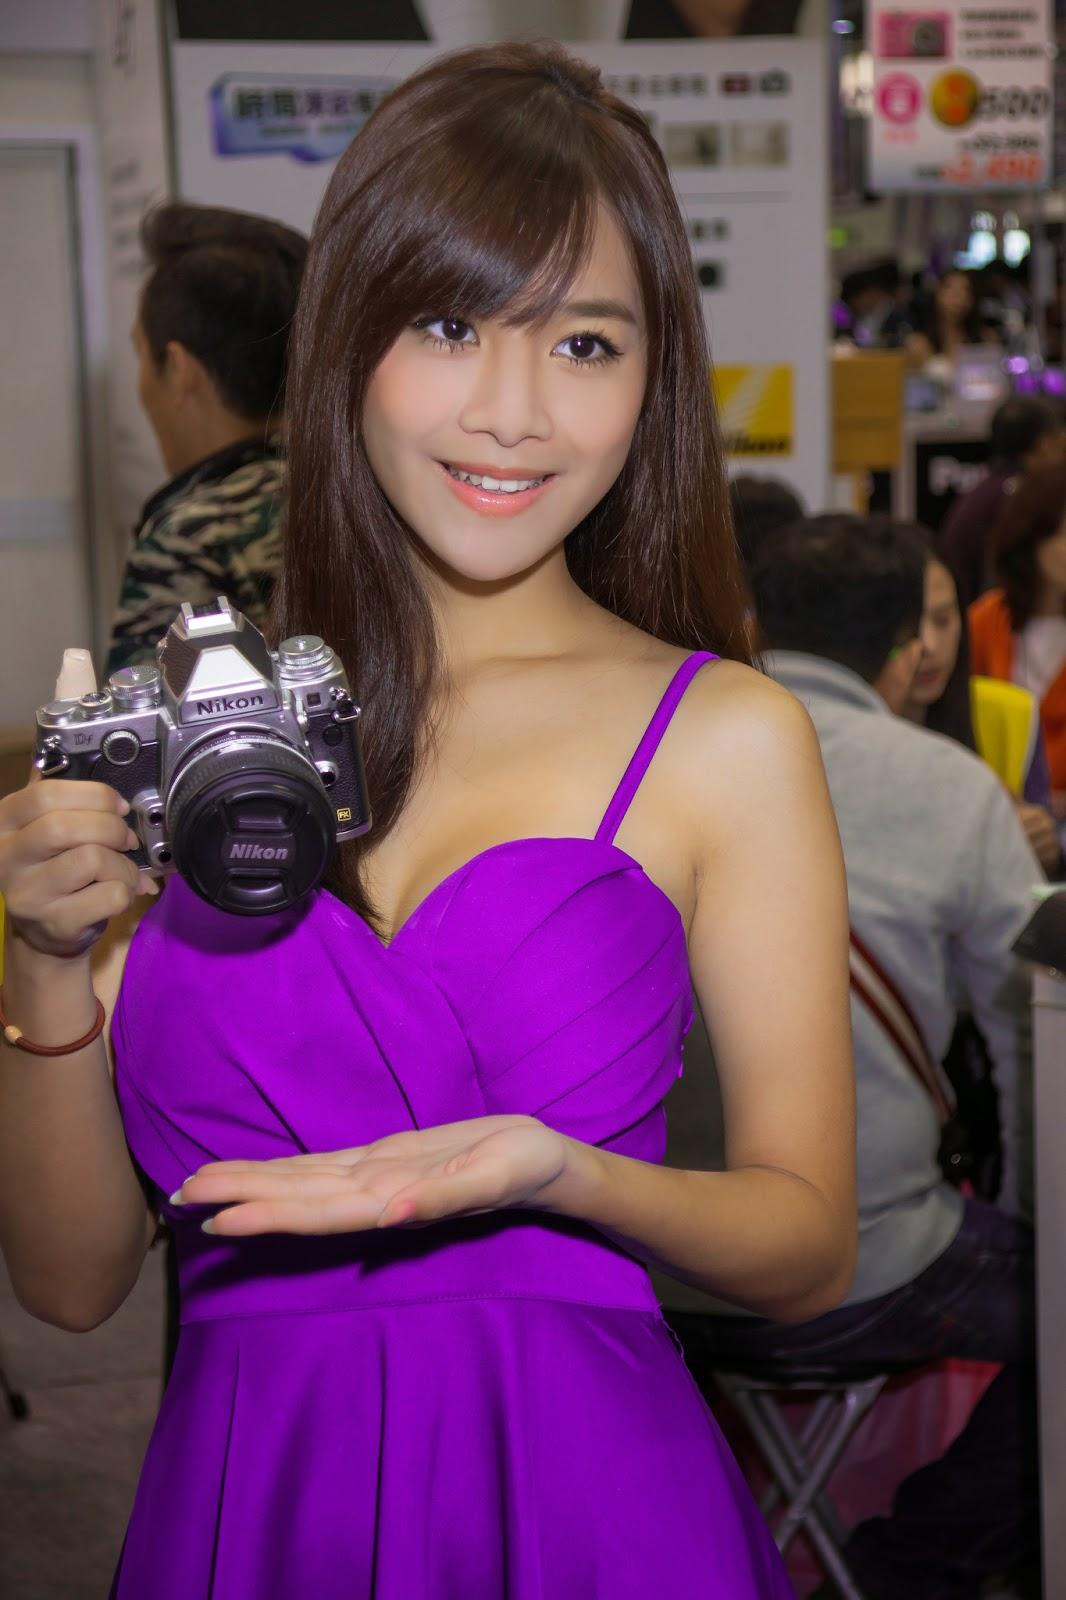 Super Sexy Asian Bikini Models At Taipei Mid Year Auto Show - HD Latest Tamil Actress, Telugu ...